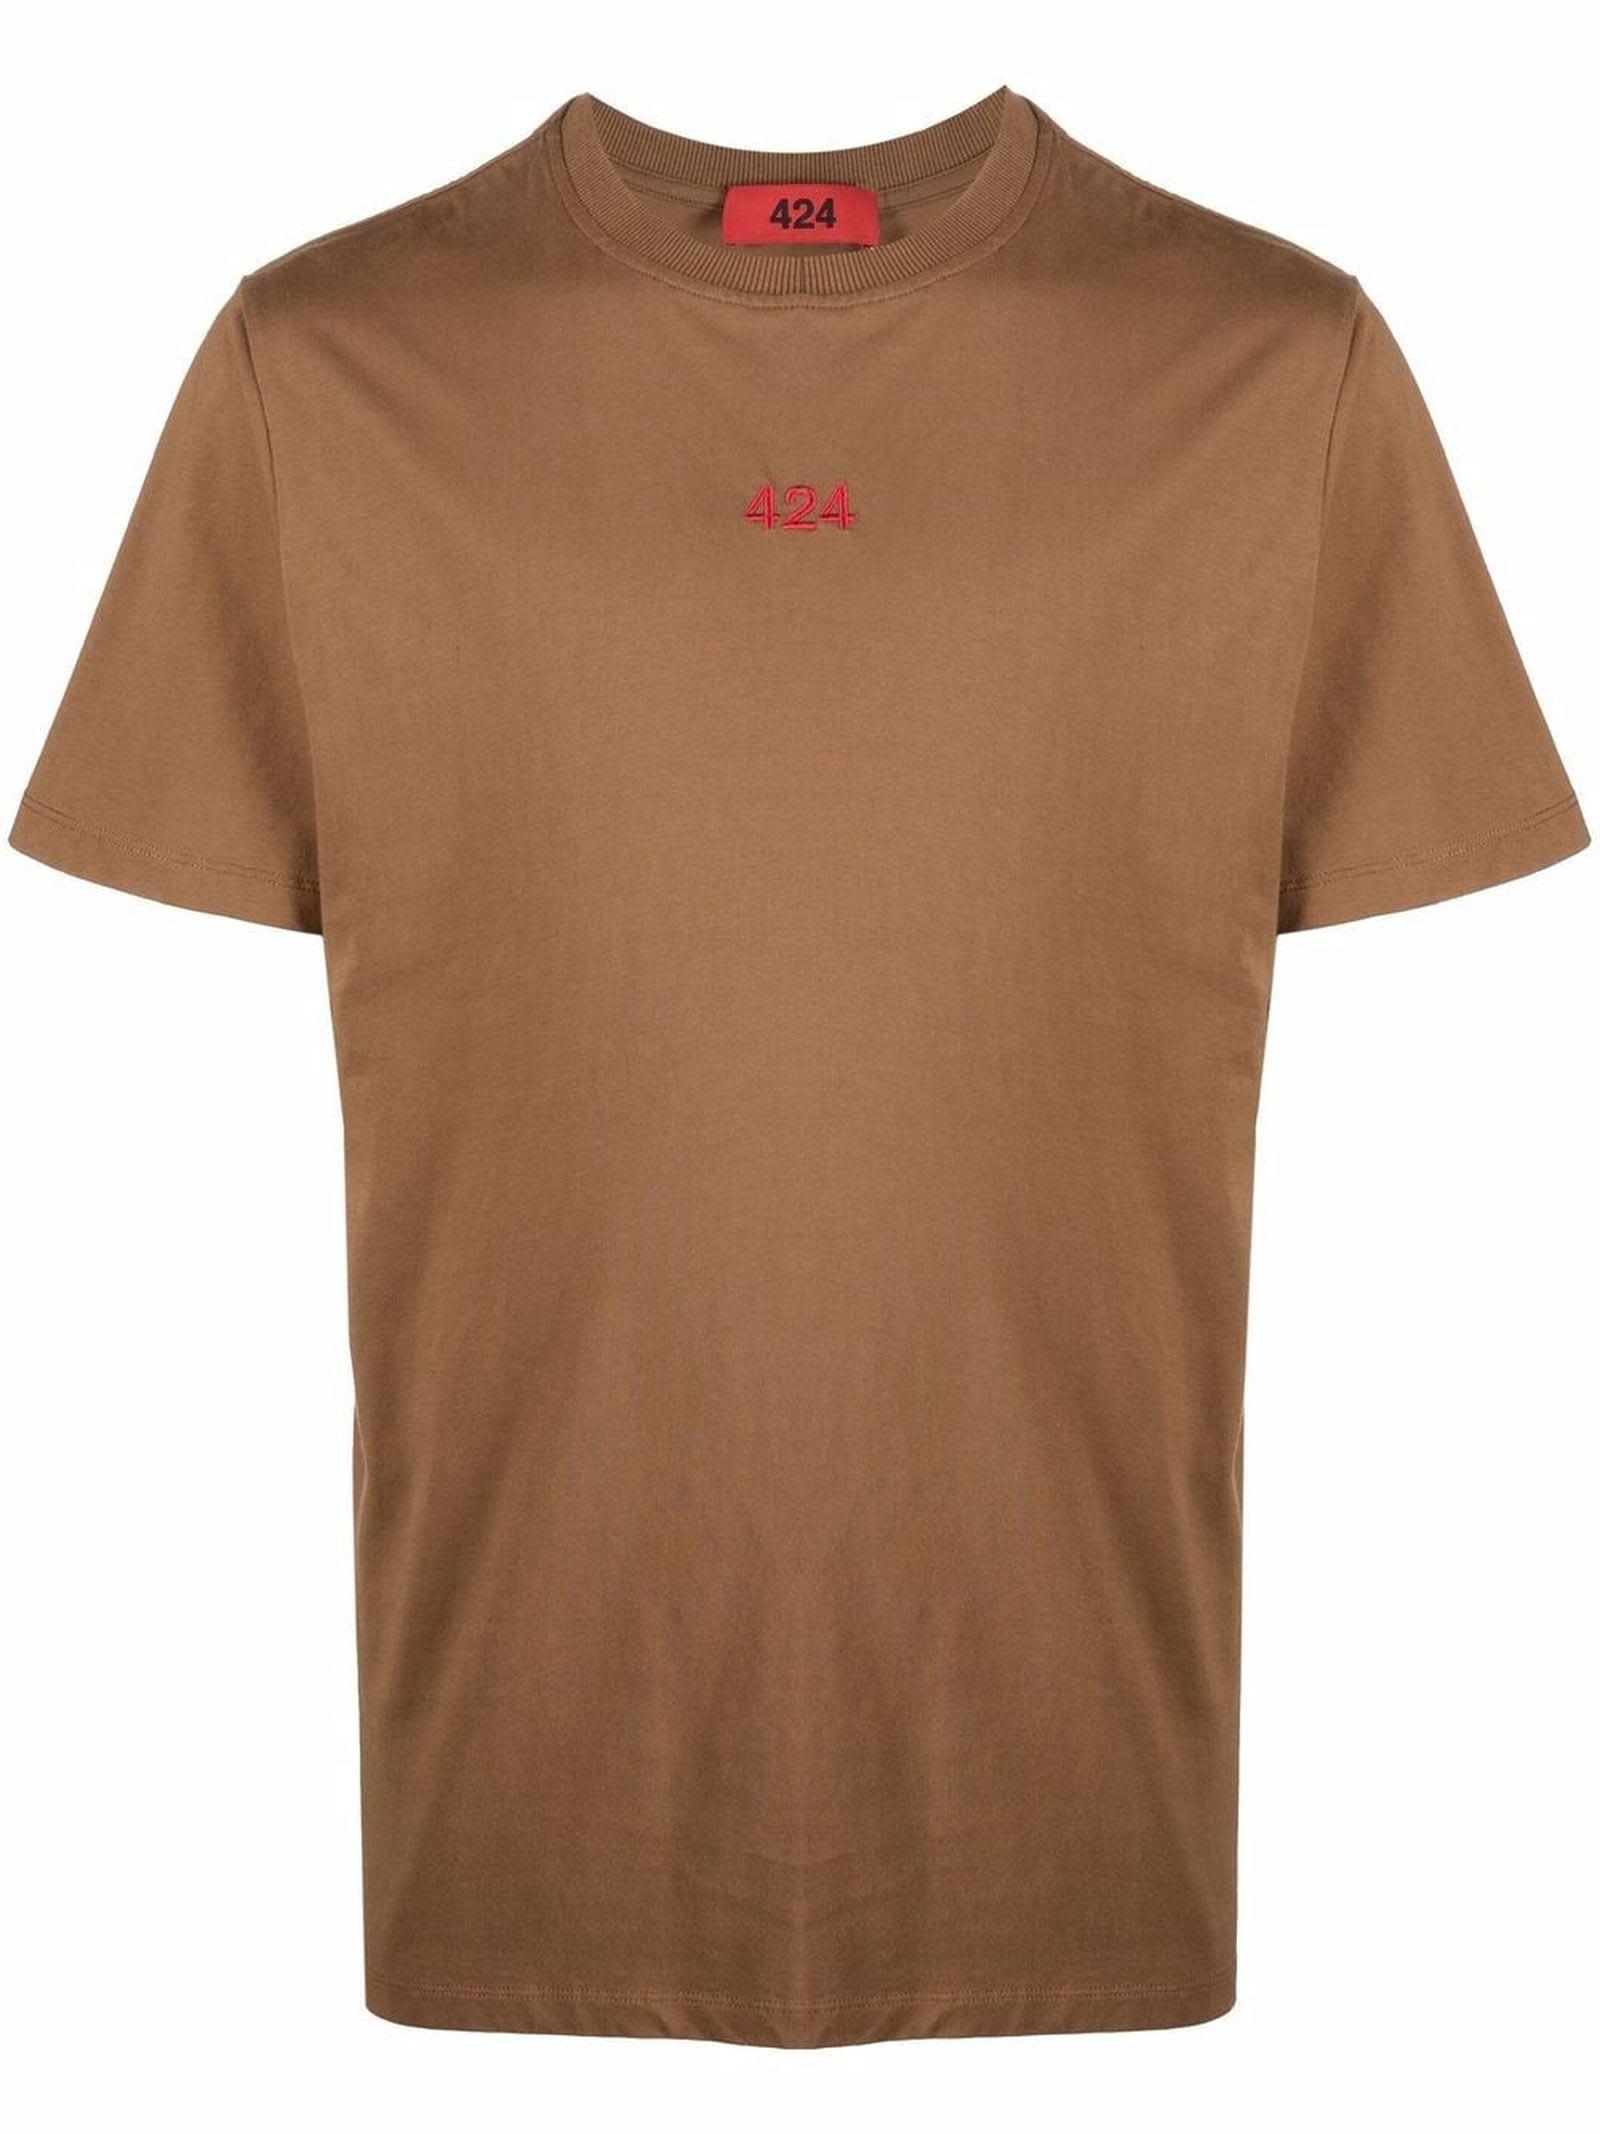 Brown Cotton T-shirt